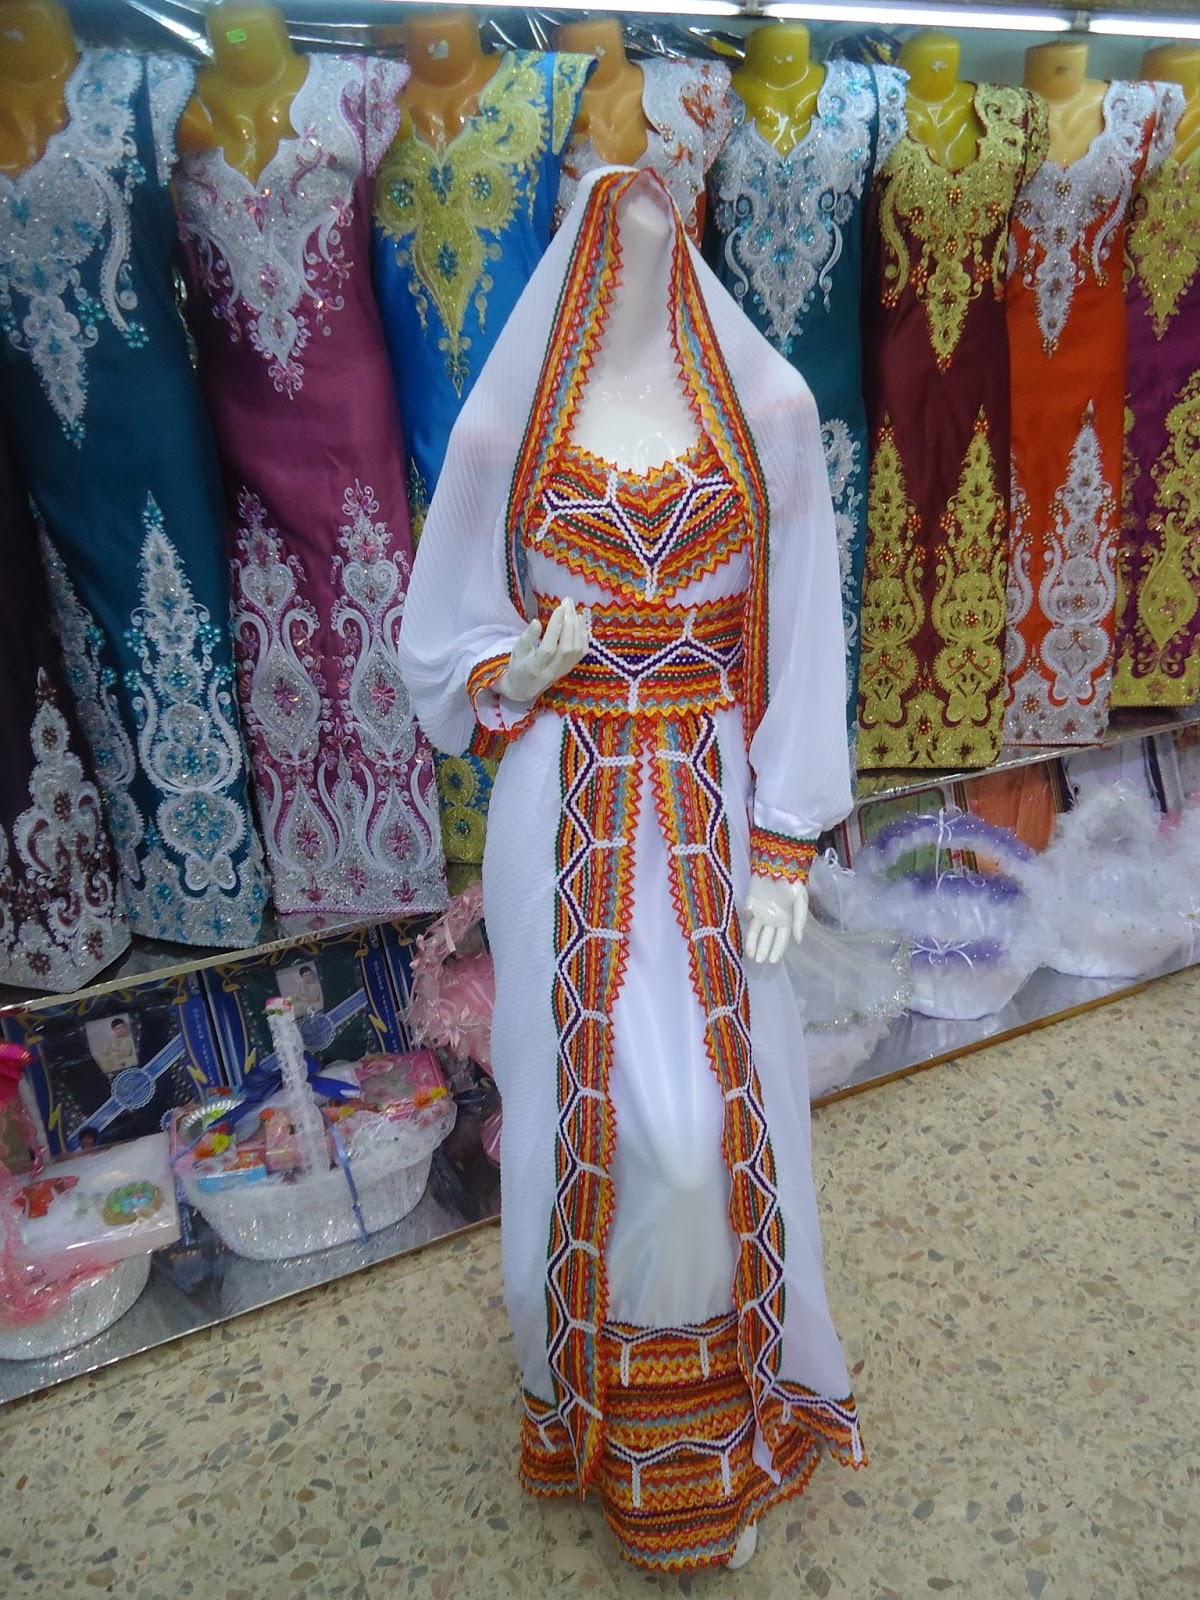 بالصور فساتين جزائرية منزلية , صور لبس جزائرى 1049 6